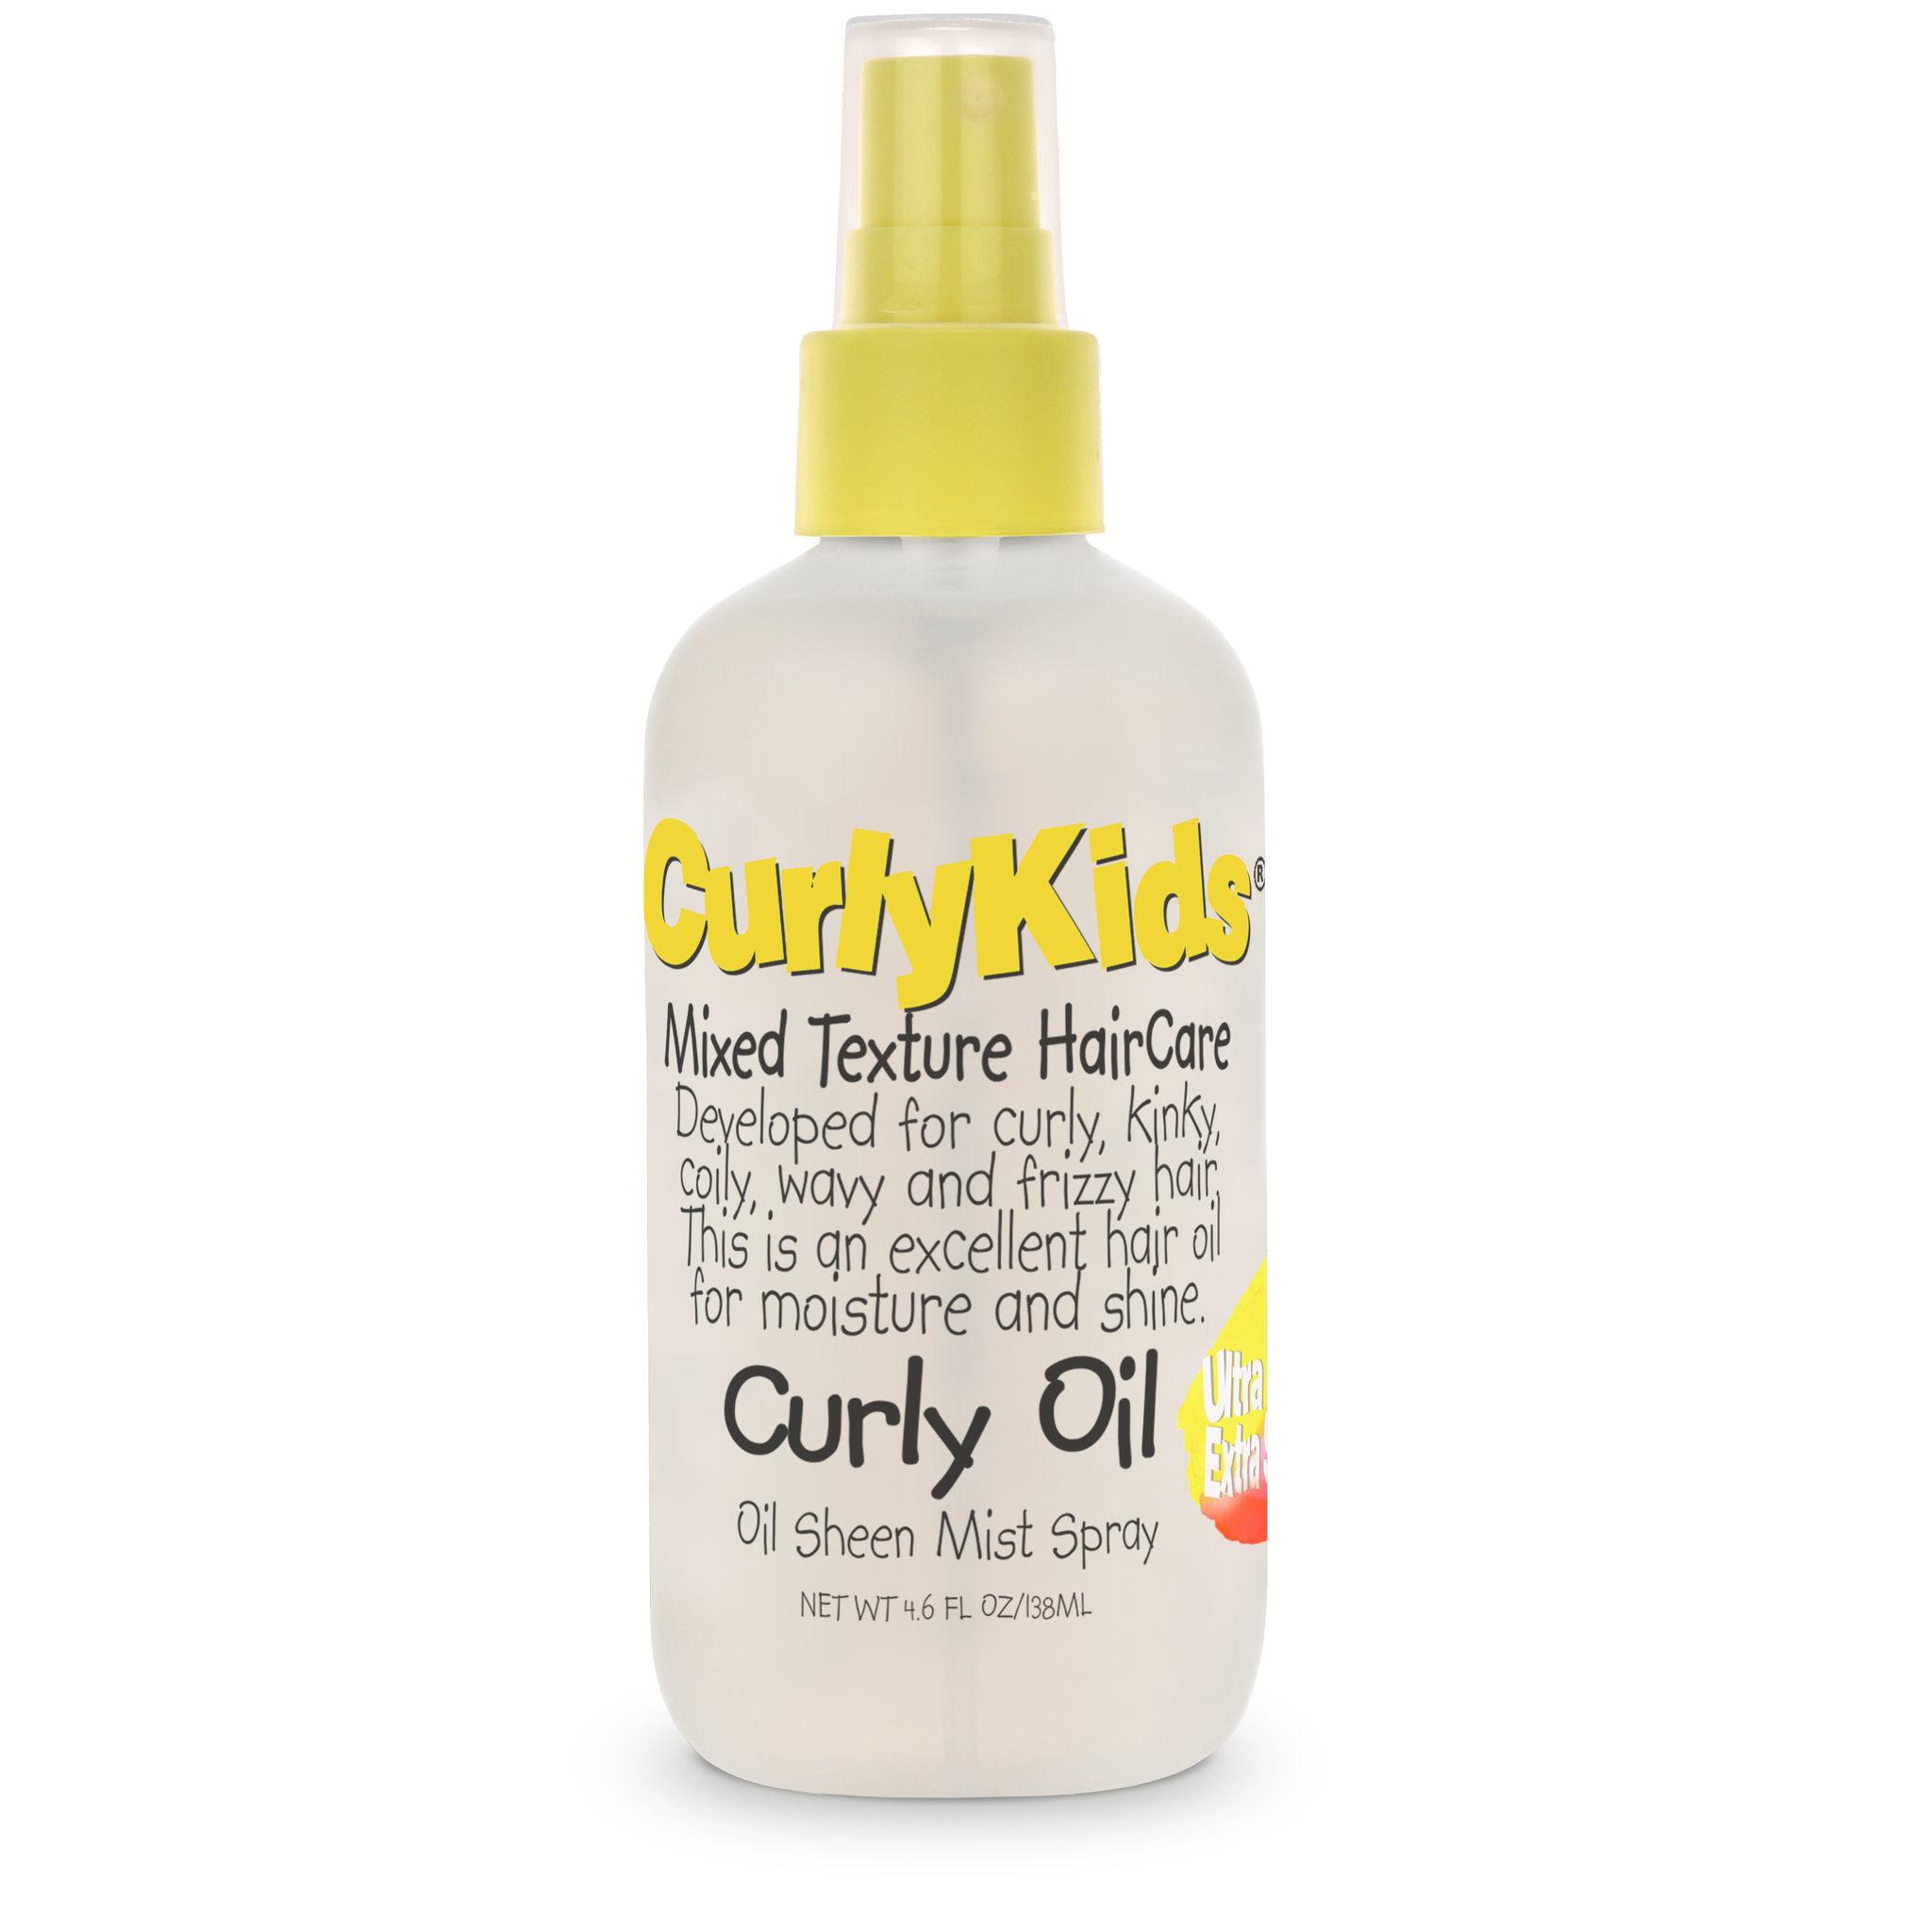 CurlyKids Curly Oil - 4.6oz